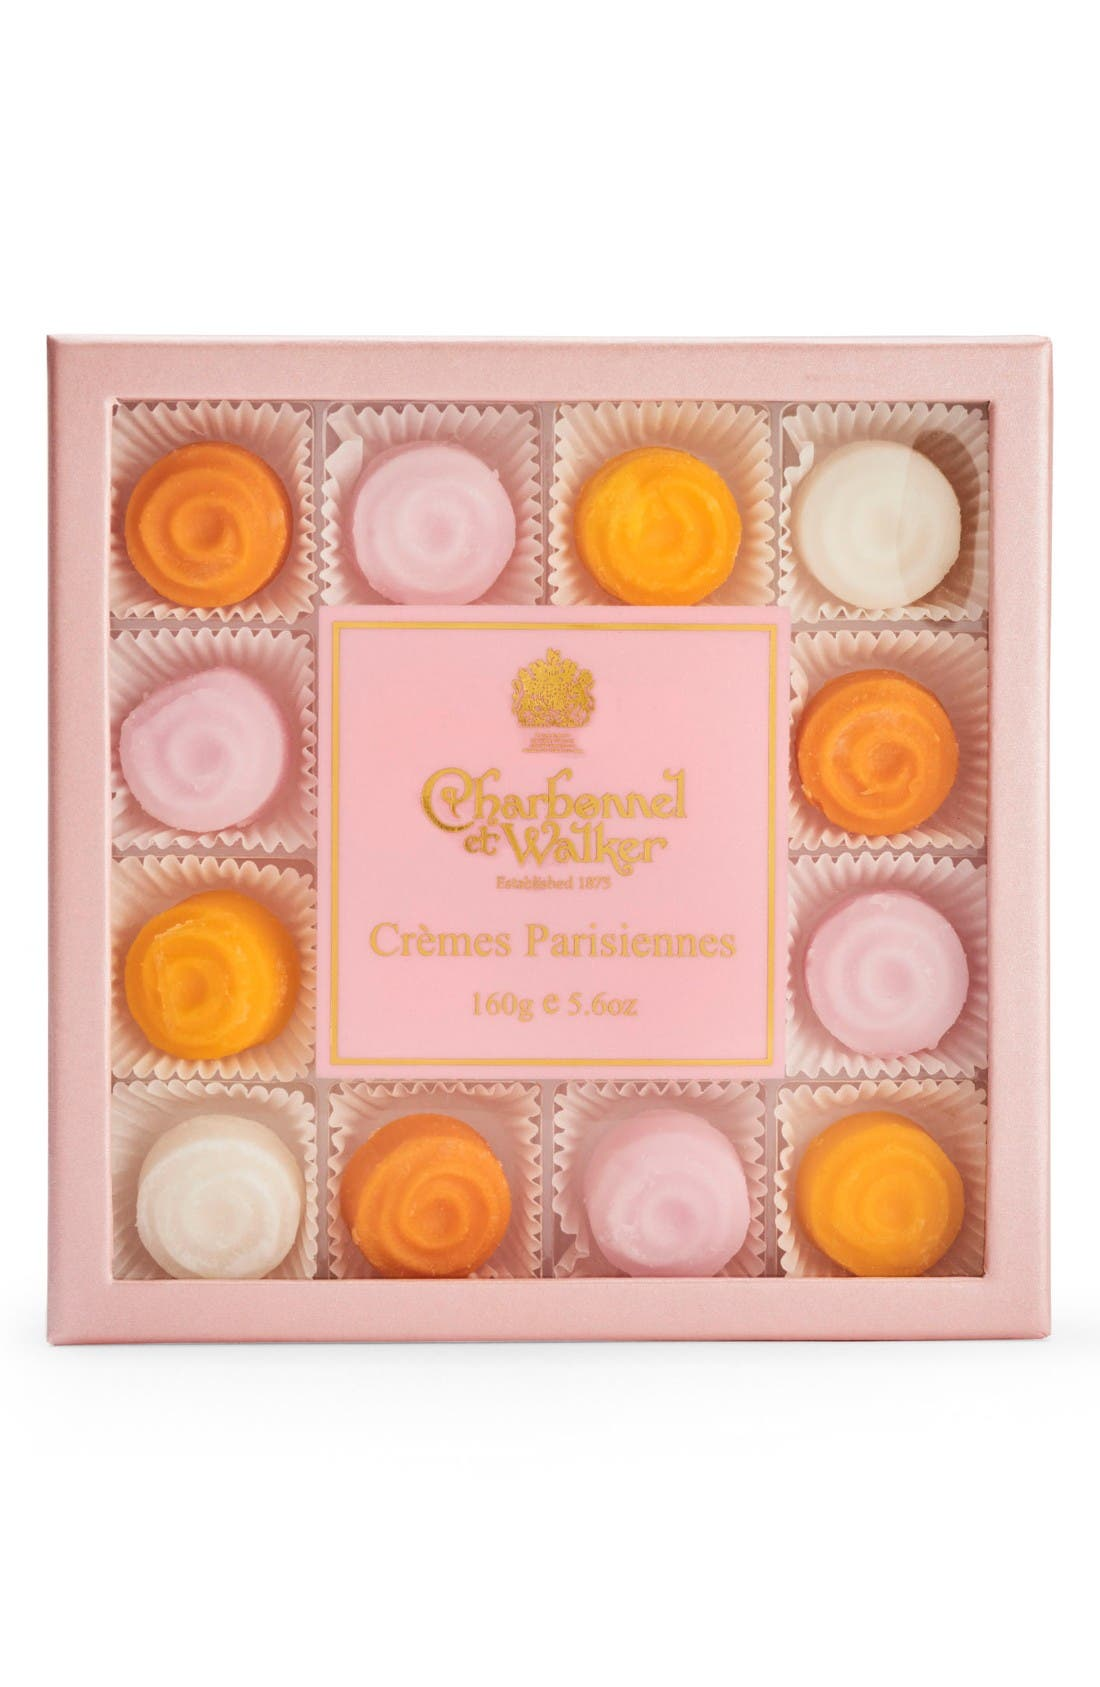 Main Image - Charbonnel et Walker Cremes Parisiennes in Gift Box